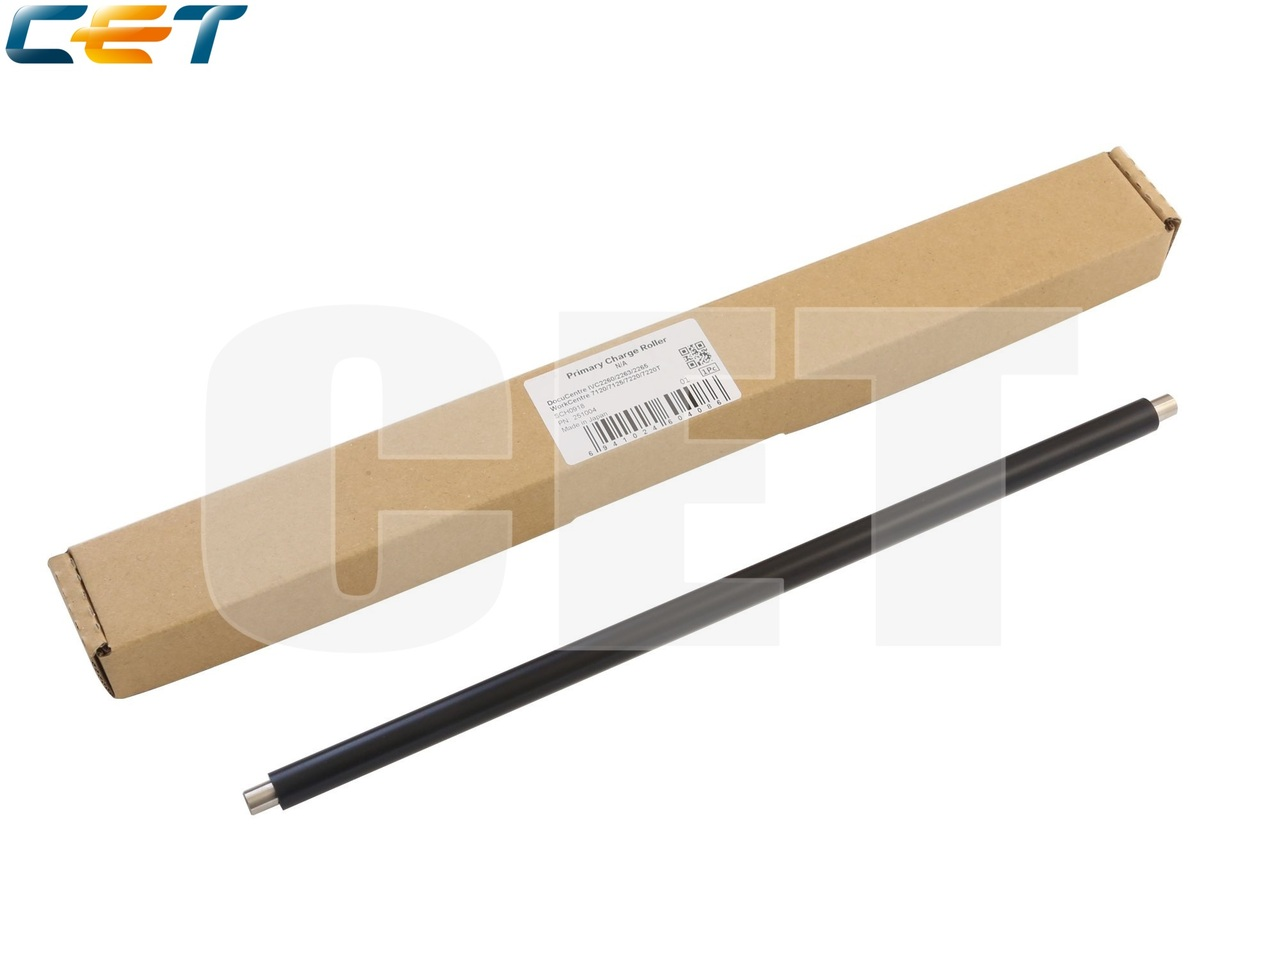 Ролик заряда для XEROX WorkCentre 7120/7125/7220/7225(CET), CET251004